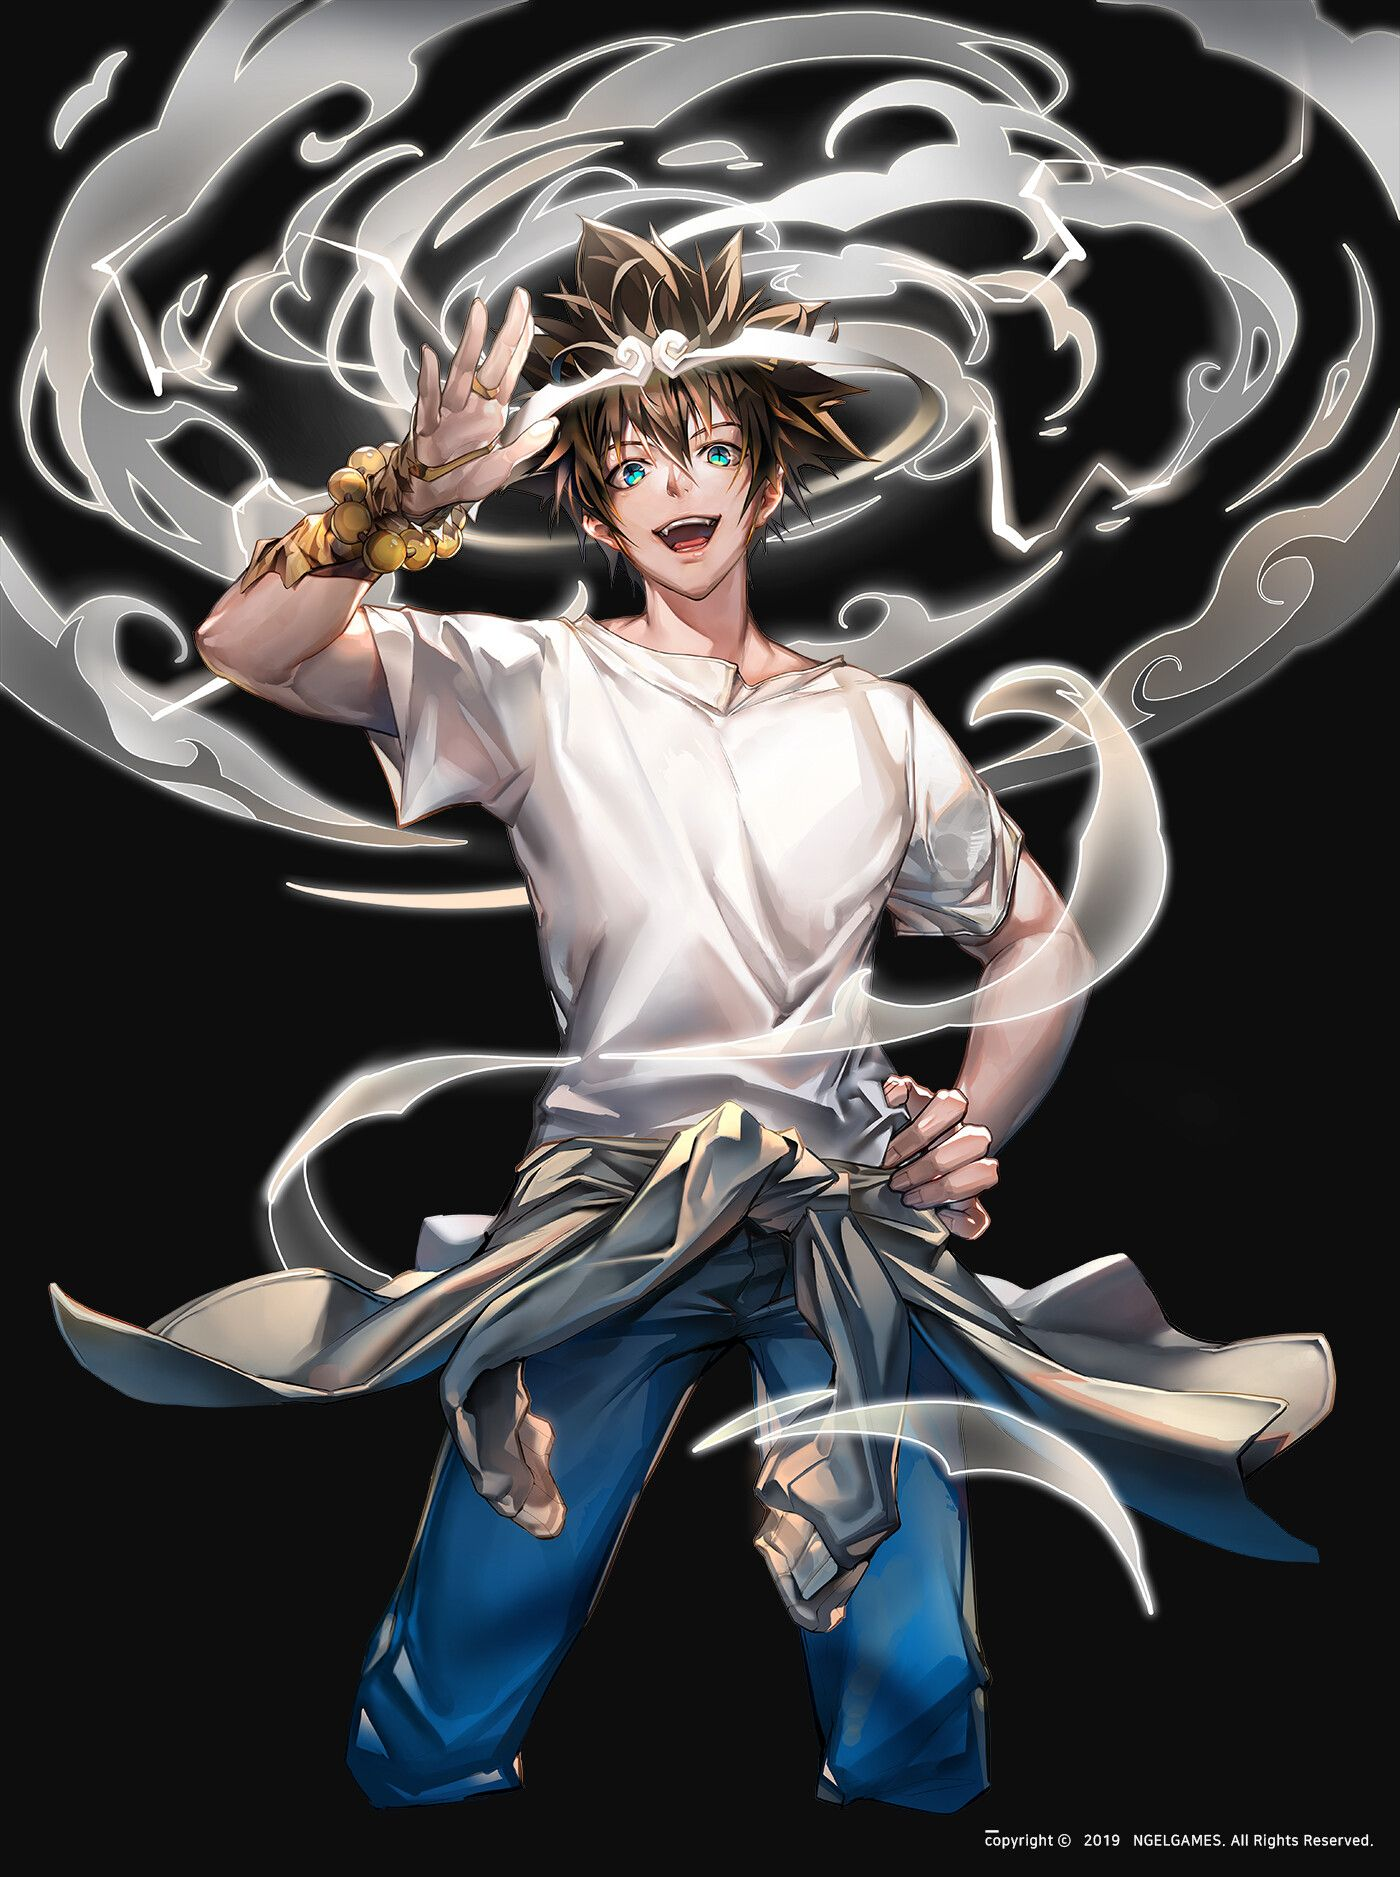 The God Of High School Wallpaper in 2020 Black anime